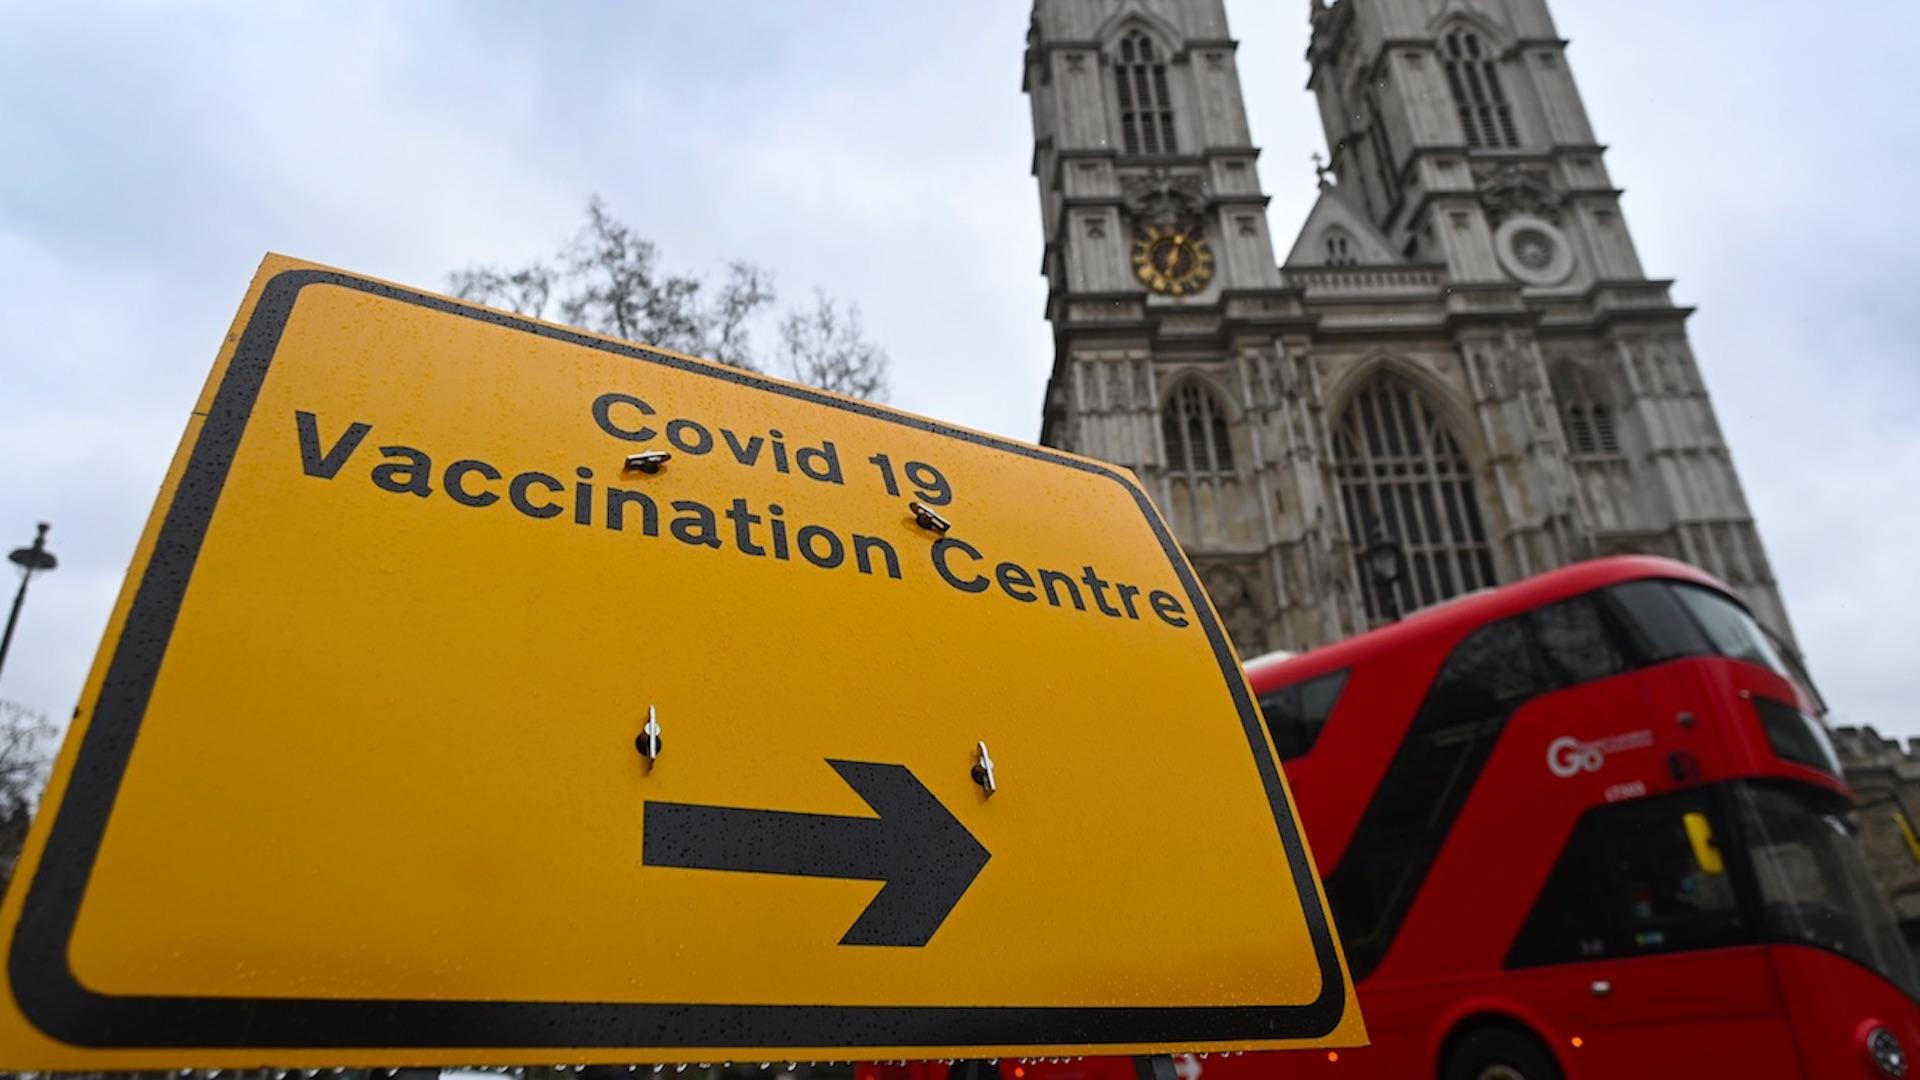 Reino Unido en alerta por tercera ola de COVID-19